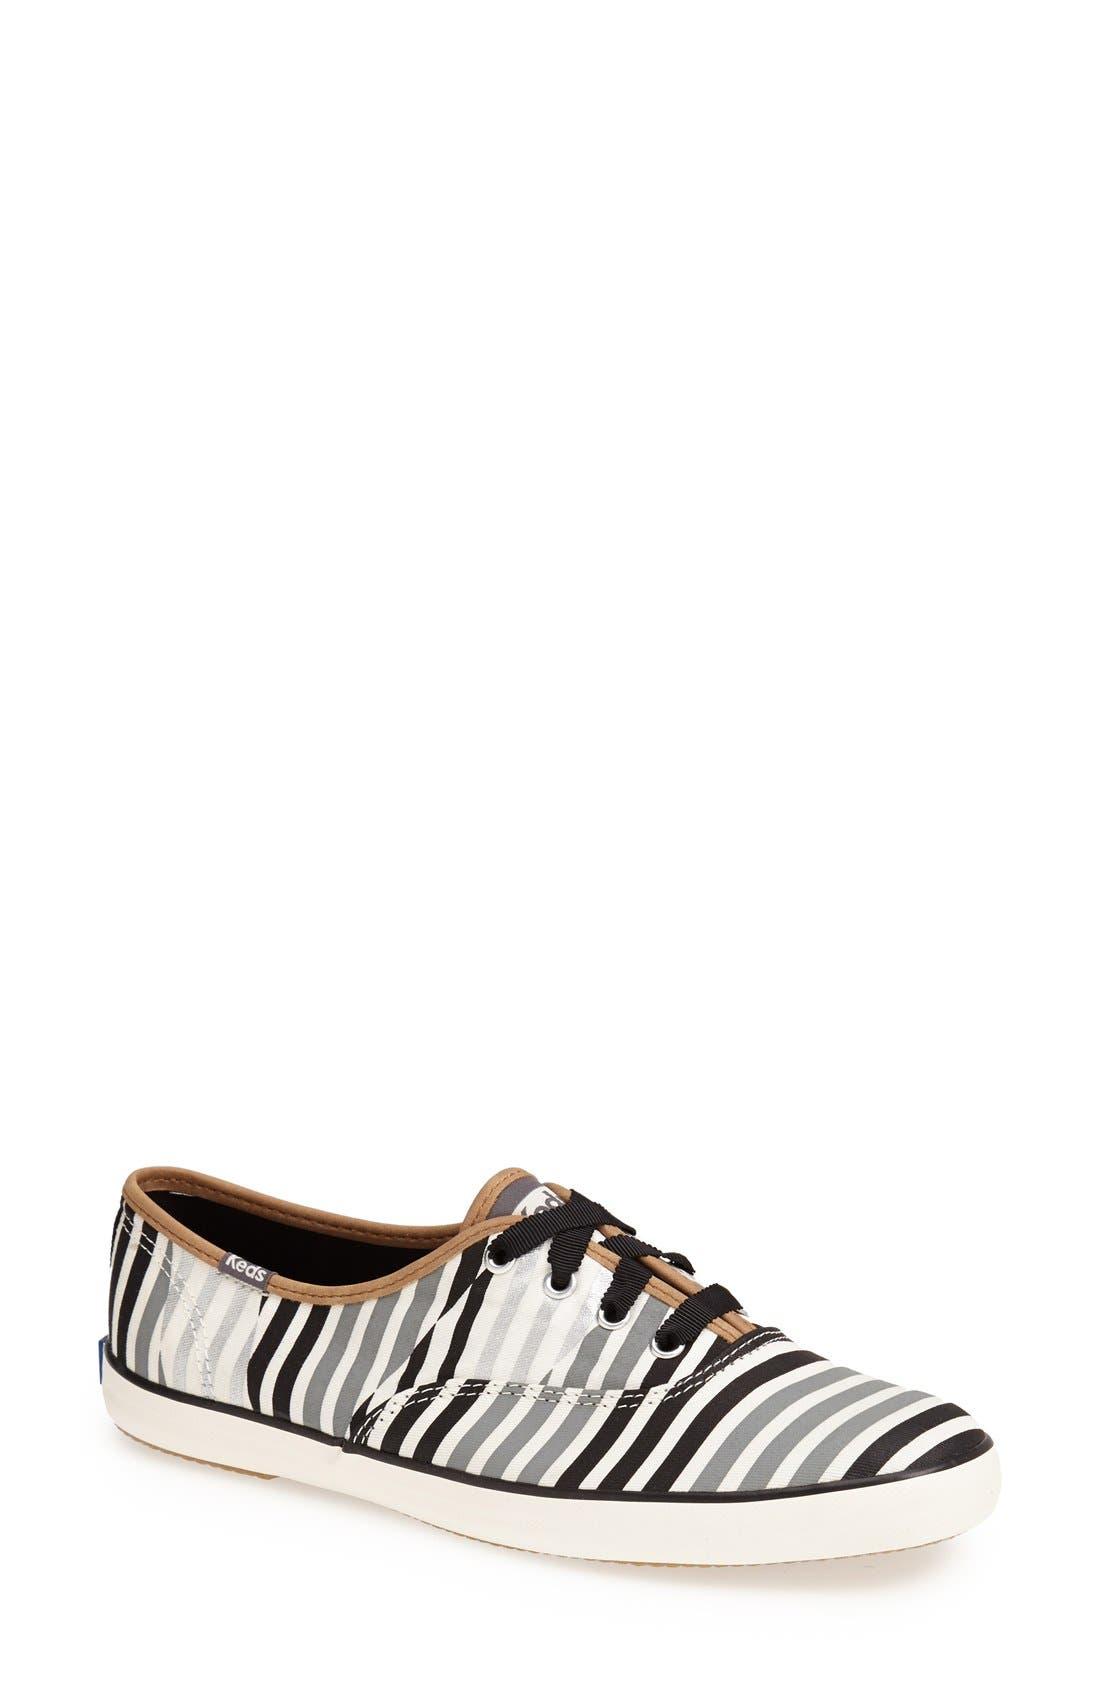 Main Image - Keds® 'Champion Stripe' Sneaker (Women)